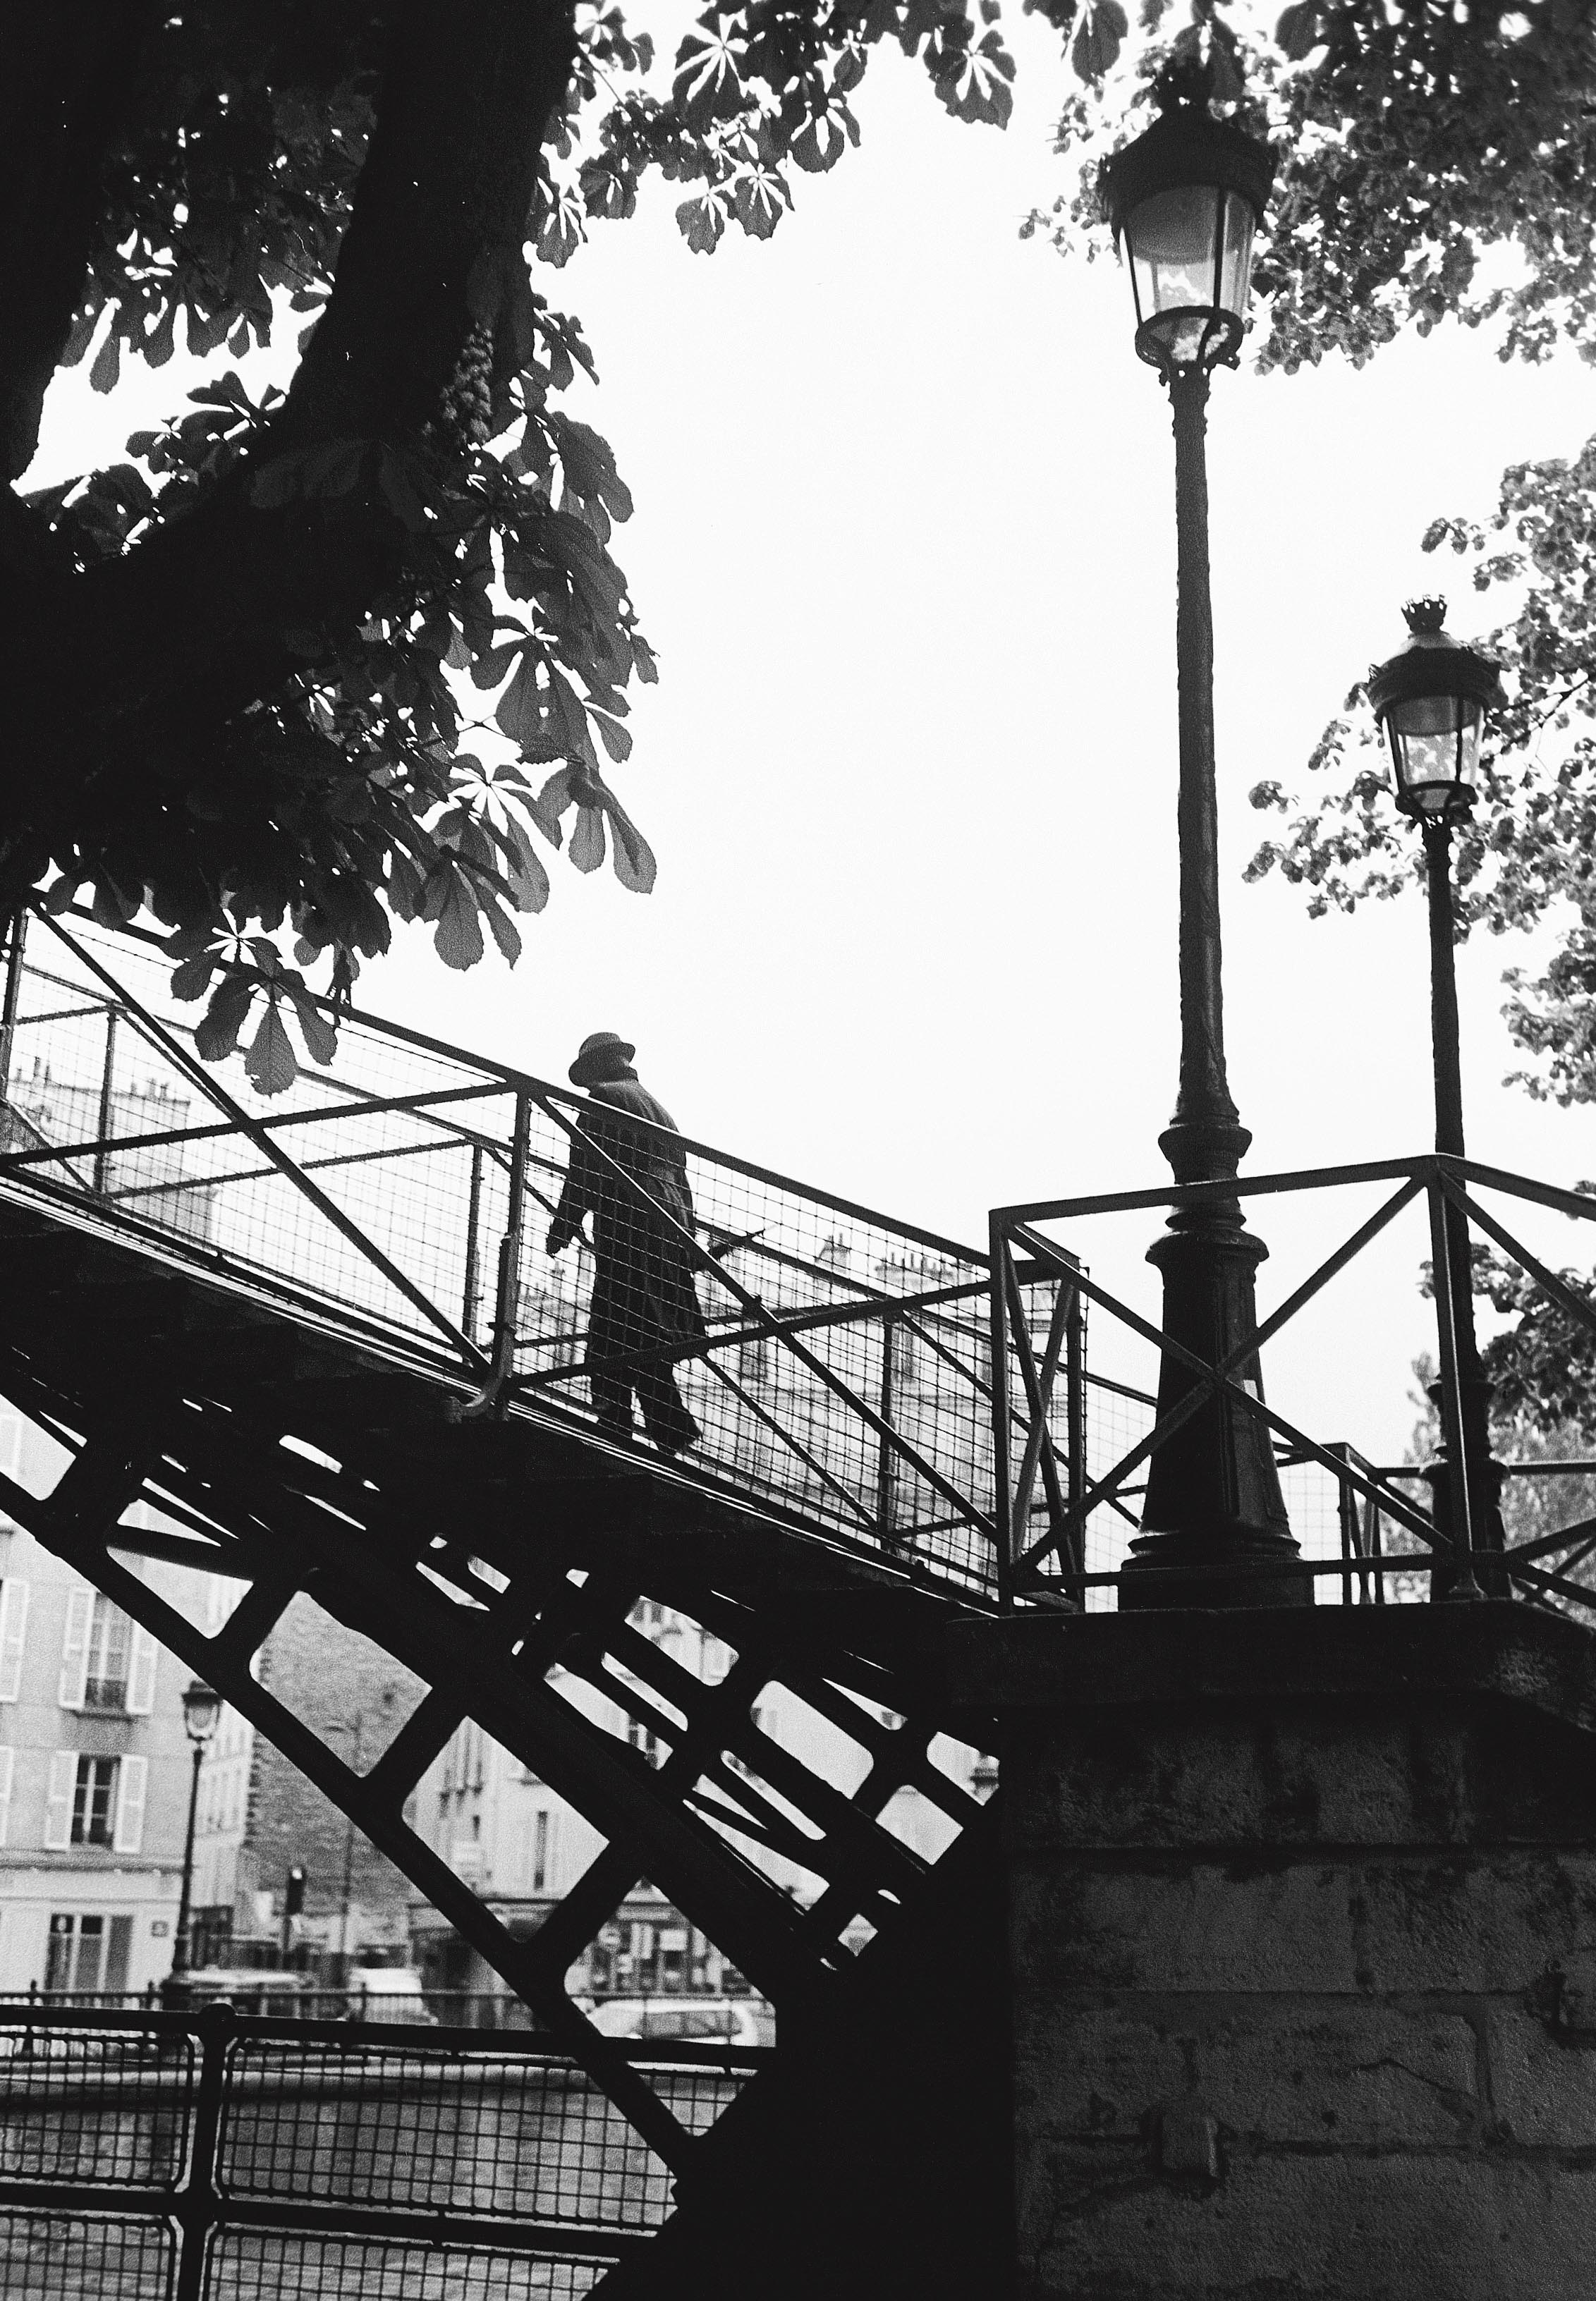 Canal Saint-Martin, Paris 2001